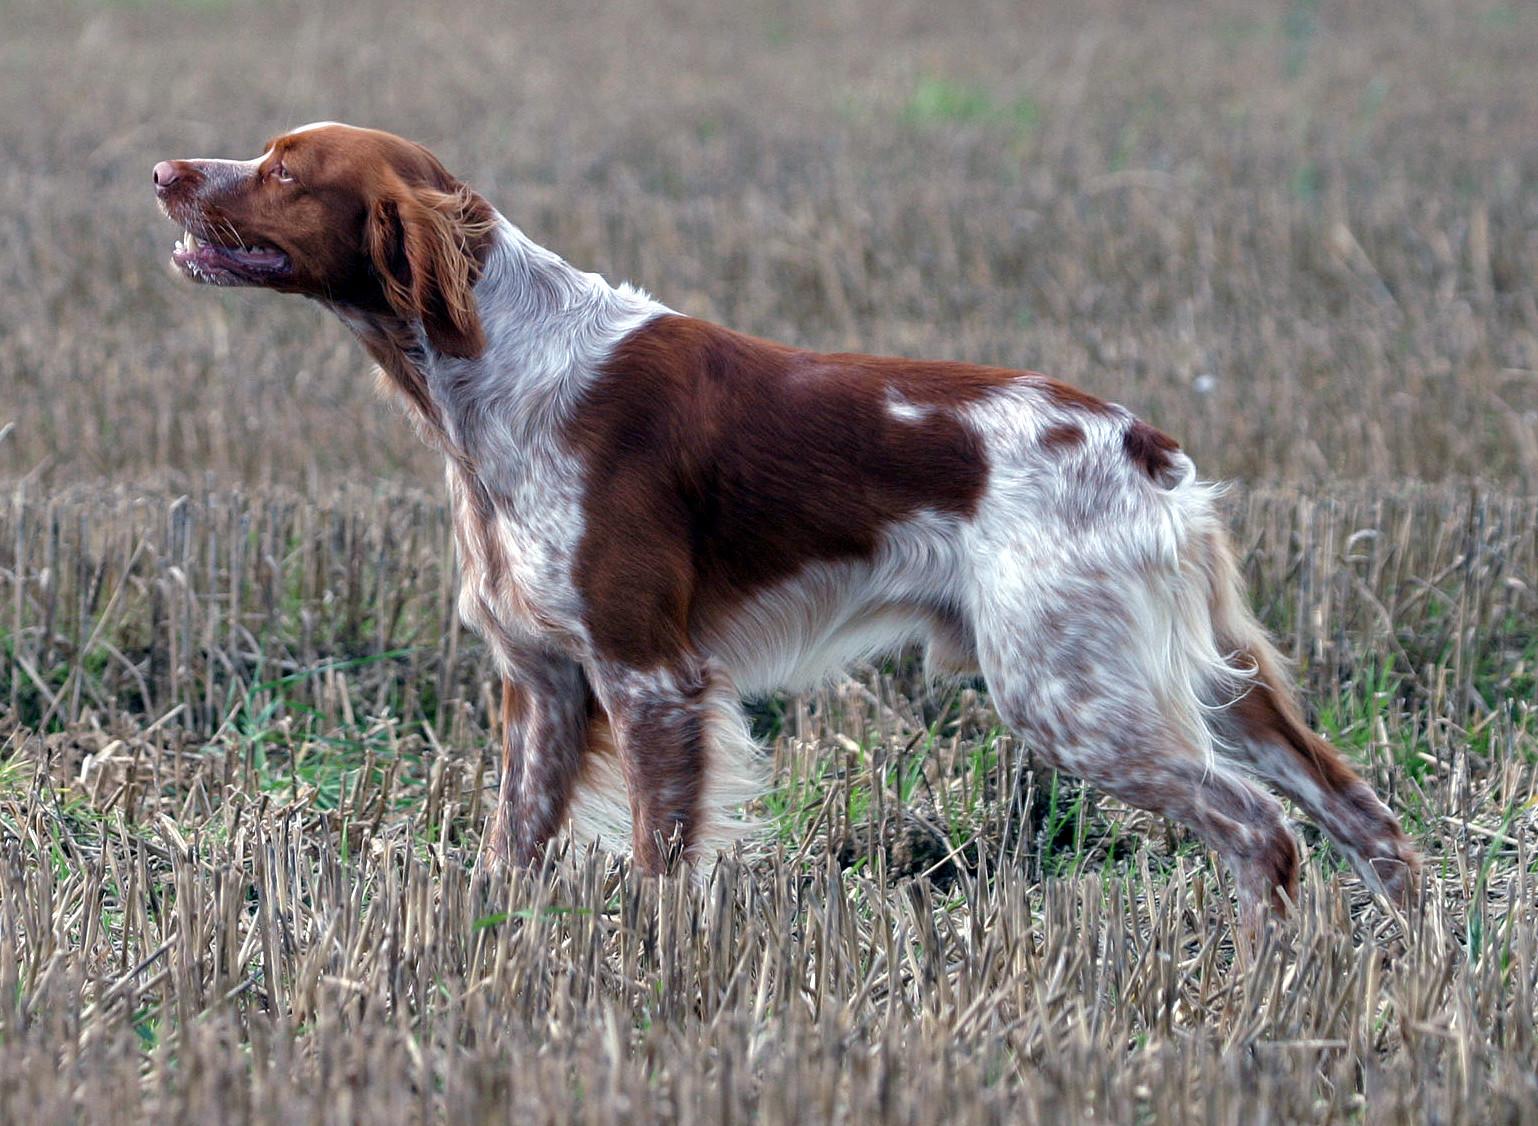 Bretonischer Vorstehhund (Epagneul Breton) - Bild: wikipedia